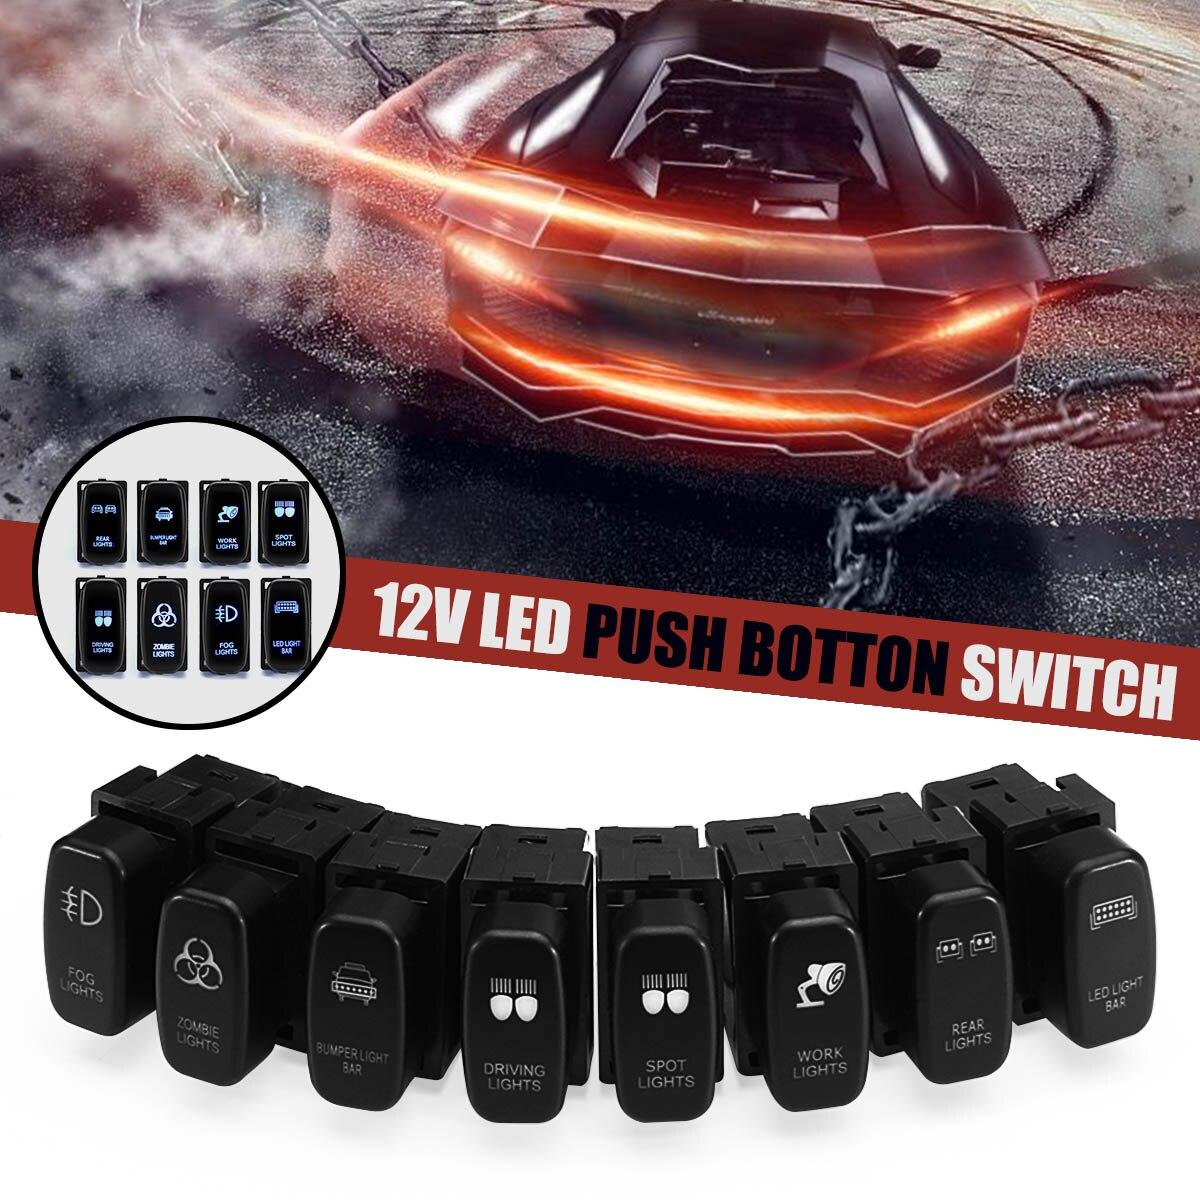 New 1pc 12V Red/Blue LED Light Bar Spot Fog Rear Light Push Button Switch Car Led Switch For Mitsubishi Pajero Trition Endeavor